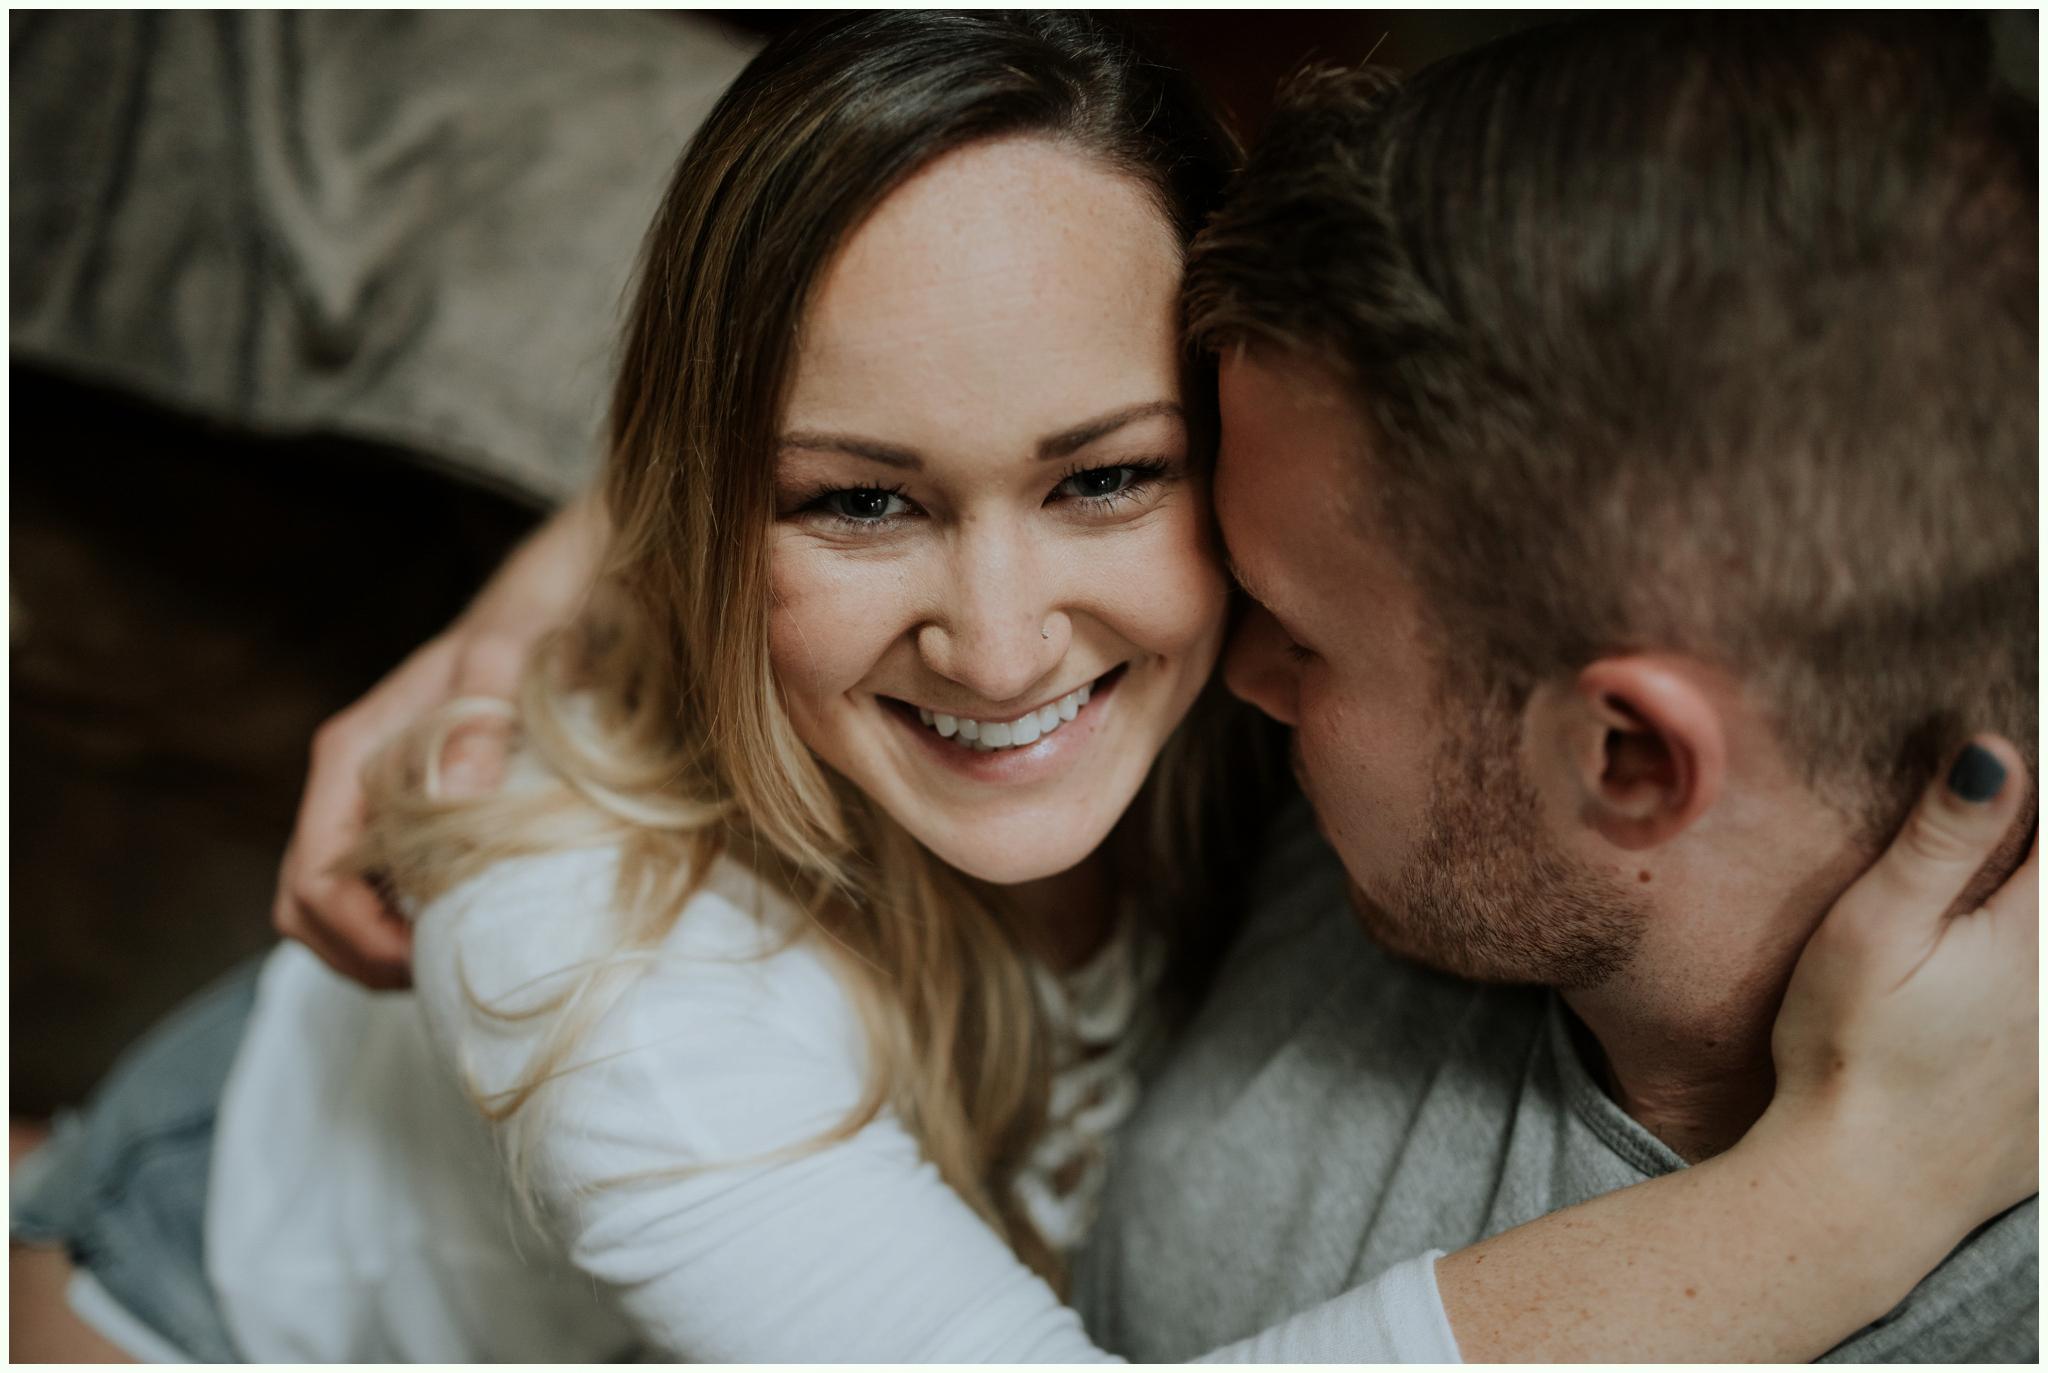 in-home-engagement-session-seattle-wedding-photographer-caitlyn-nikula-4.jpg